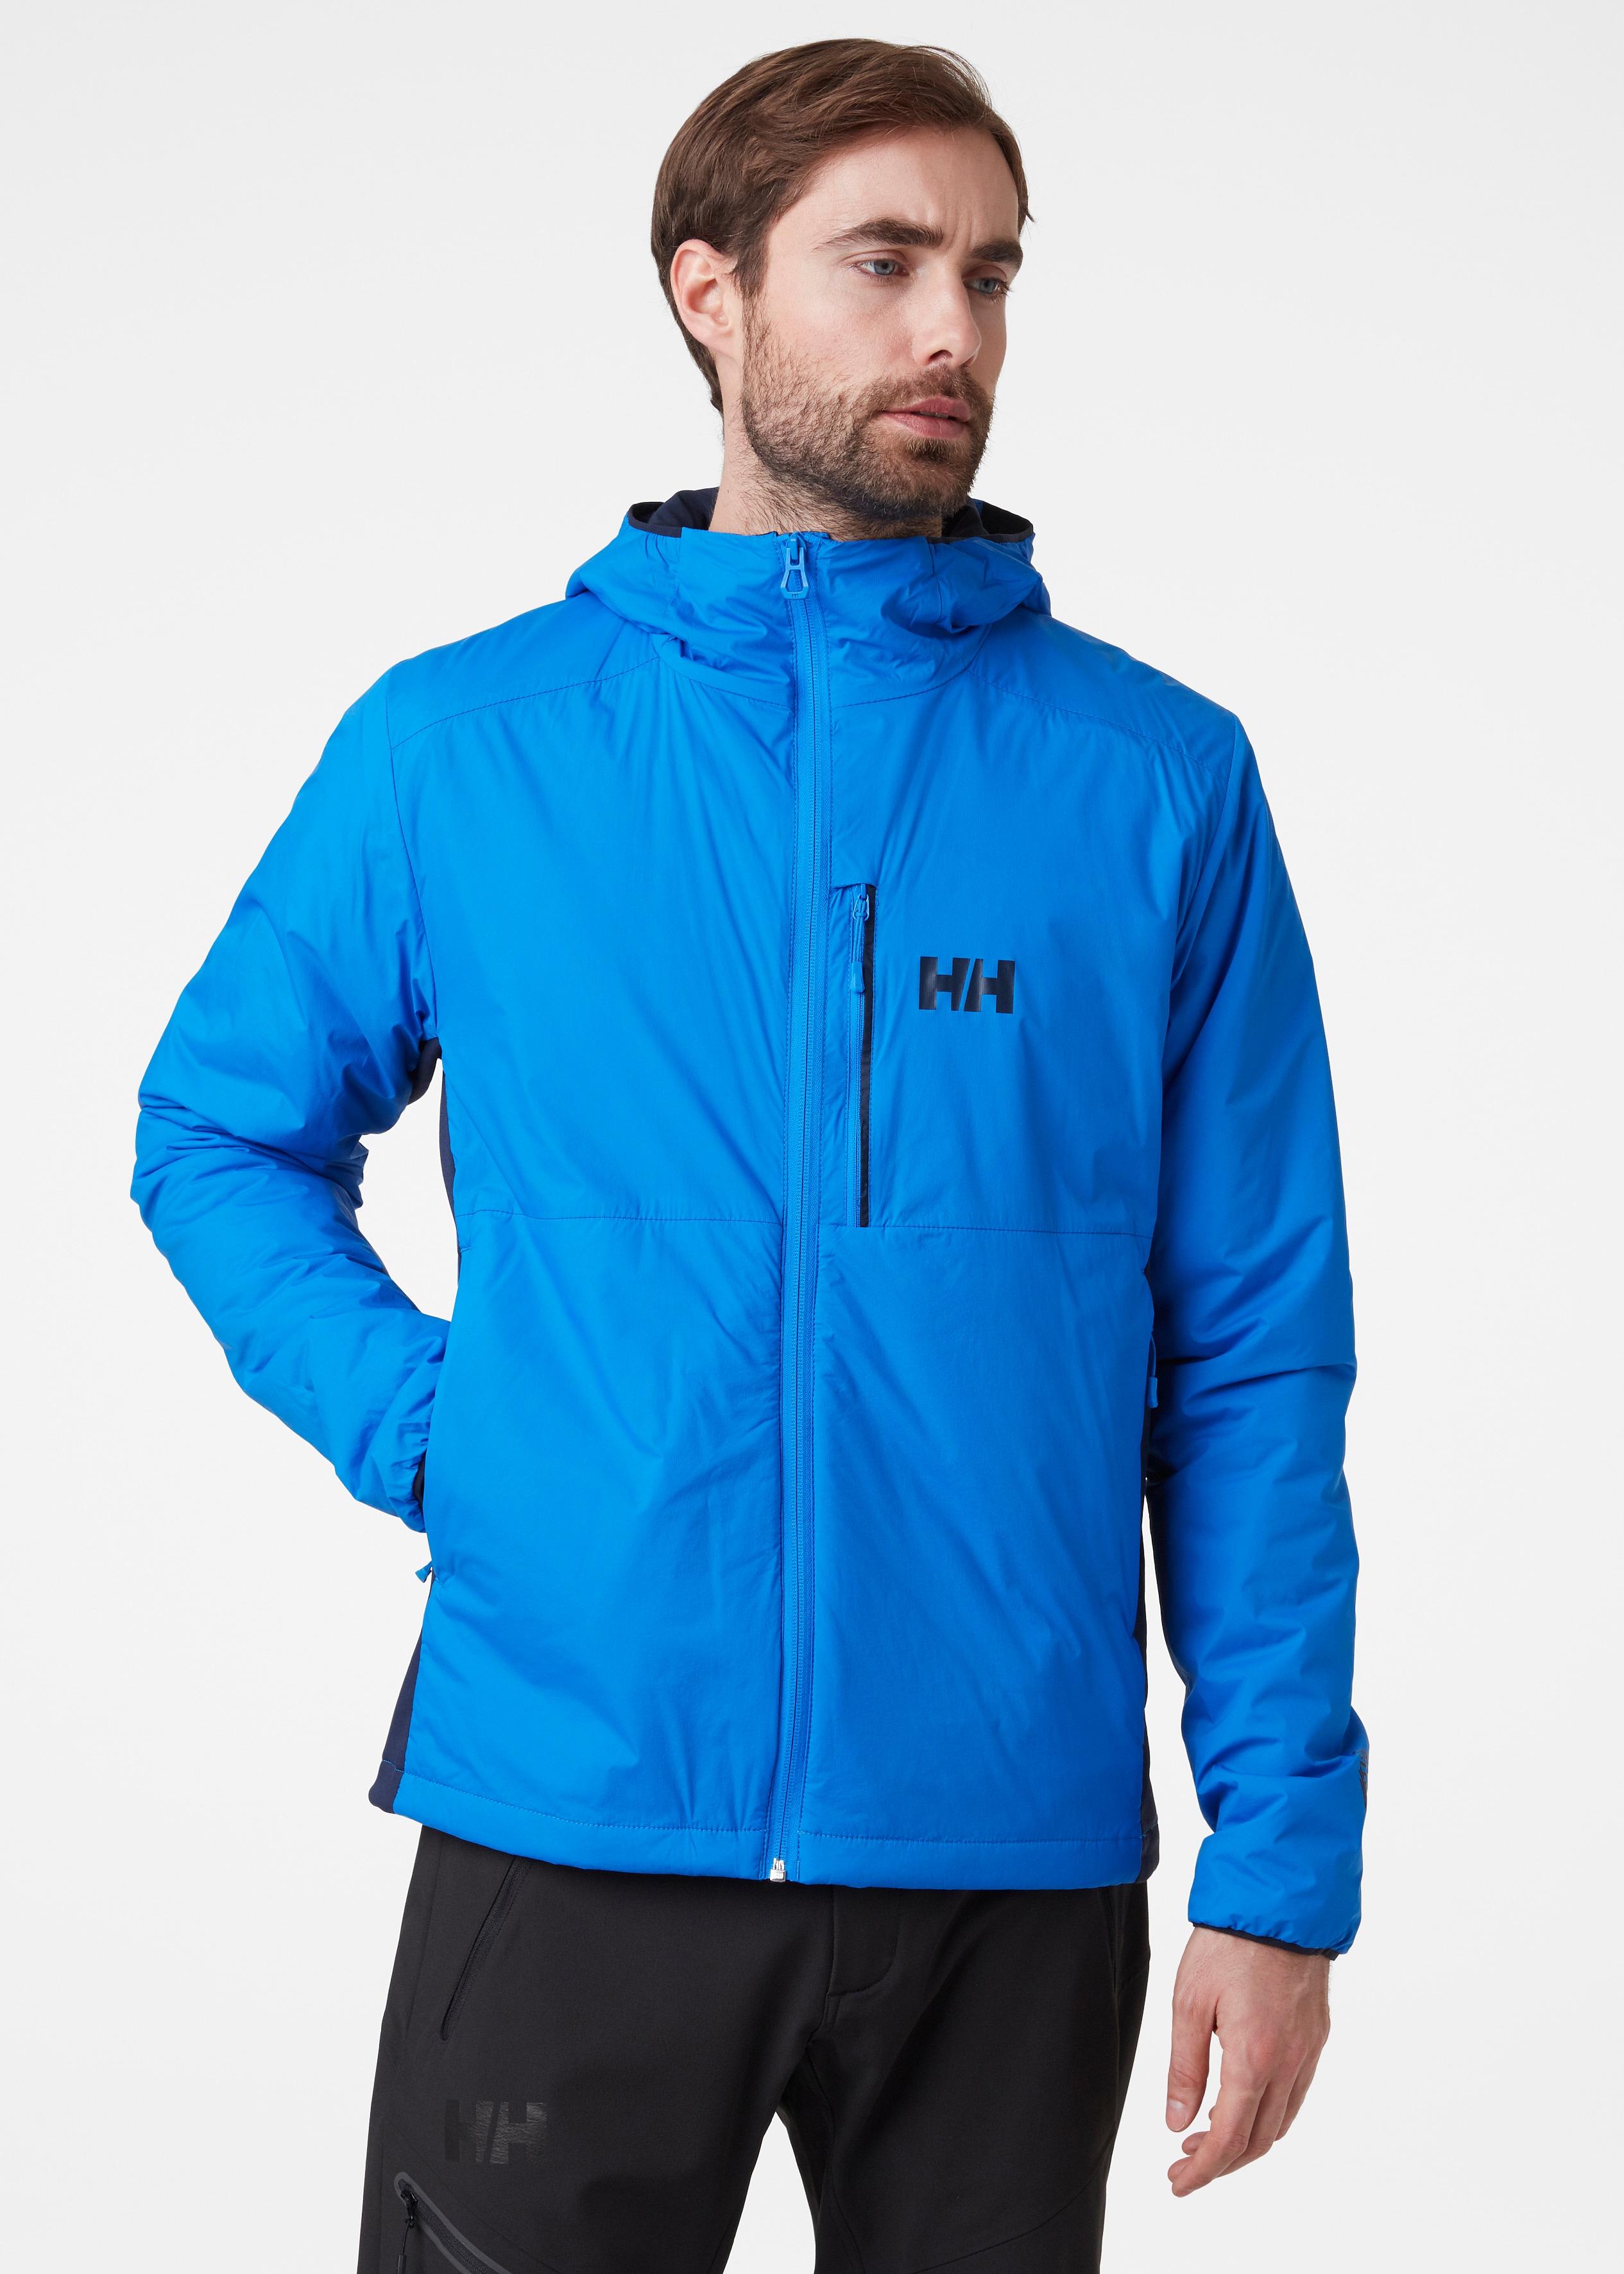 Helly Hansen Odin stretch hooded light insulator jacket